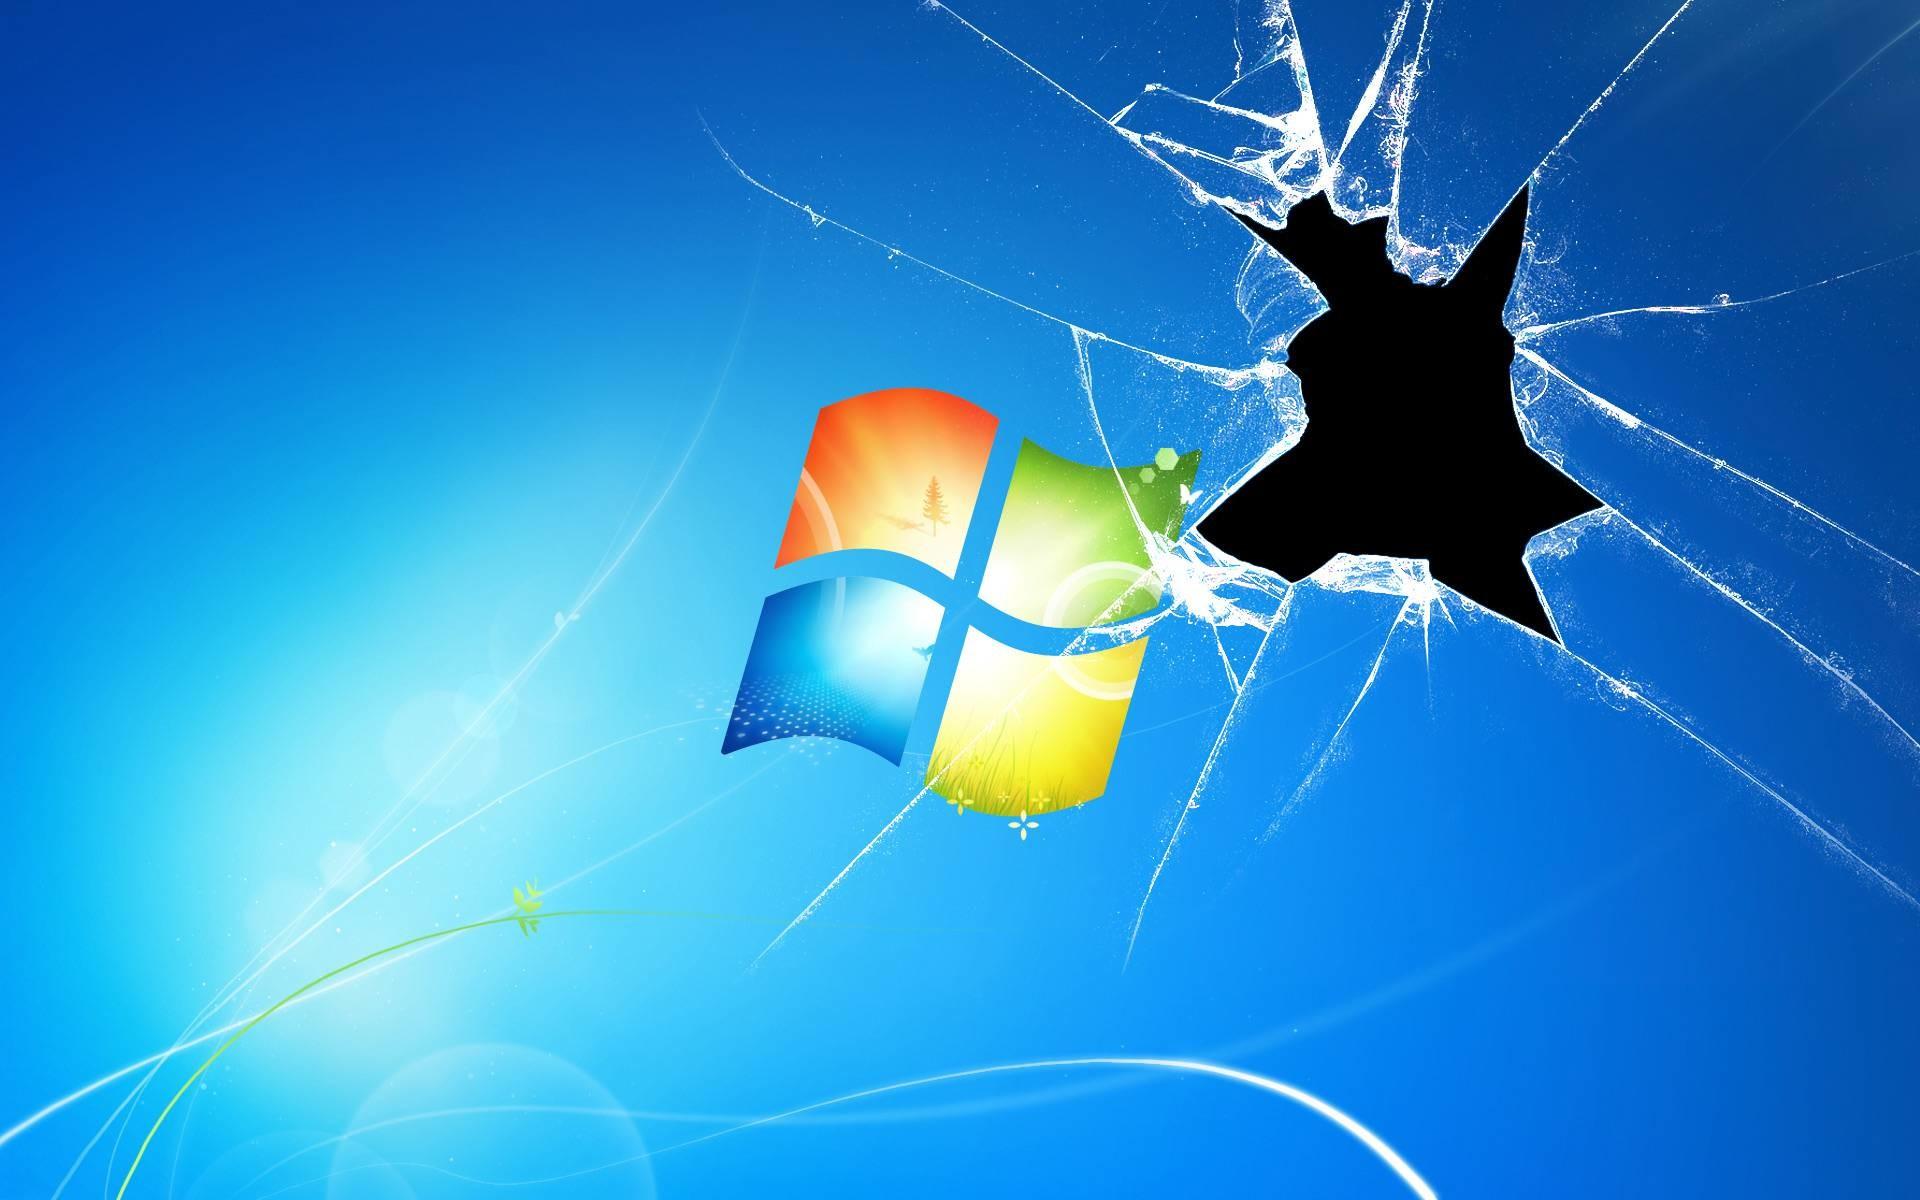 Home Screen Wallpaper Windows 8 66 Images